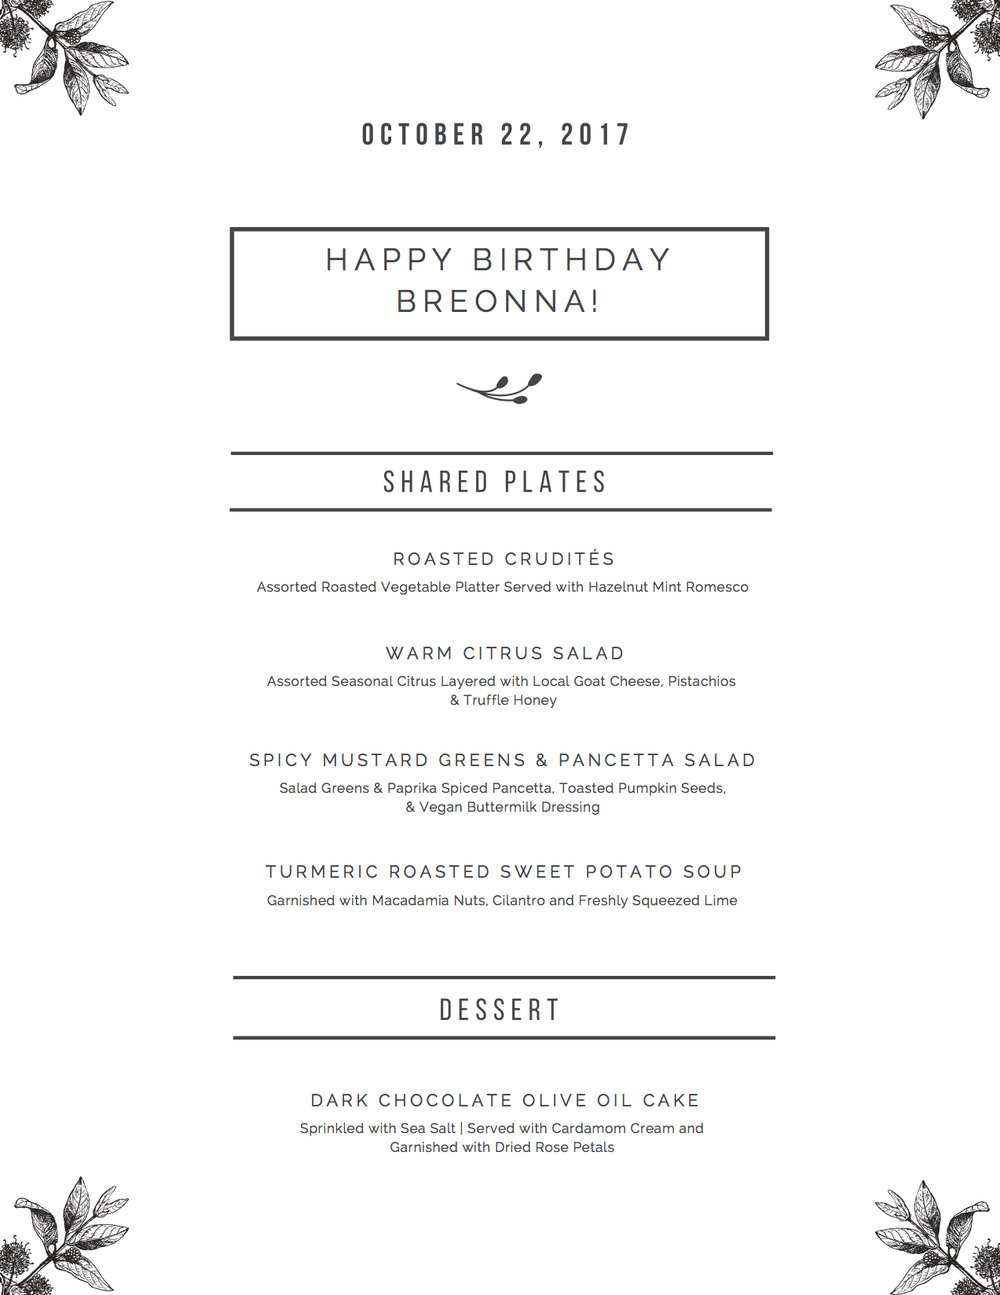 Breonna's Birthday Lunch.jpg